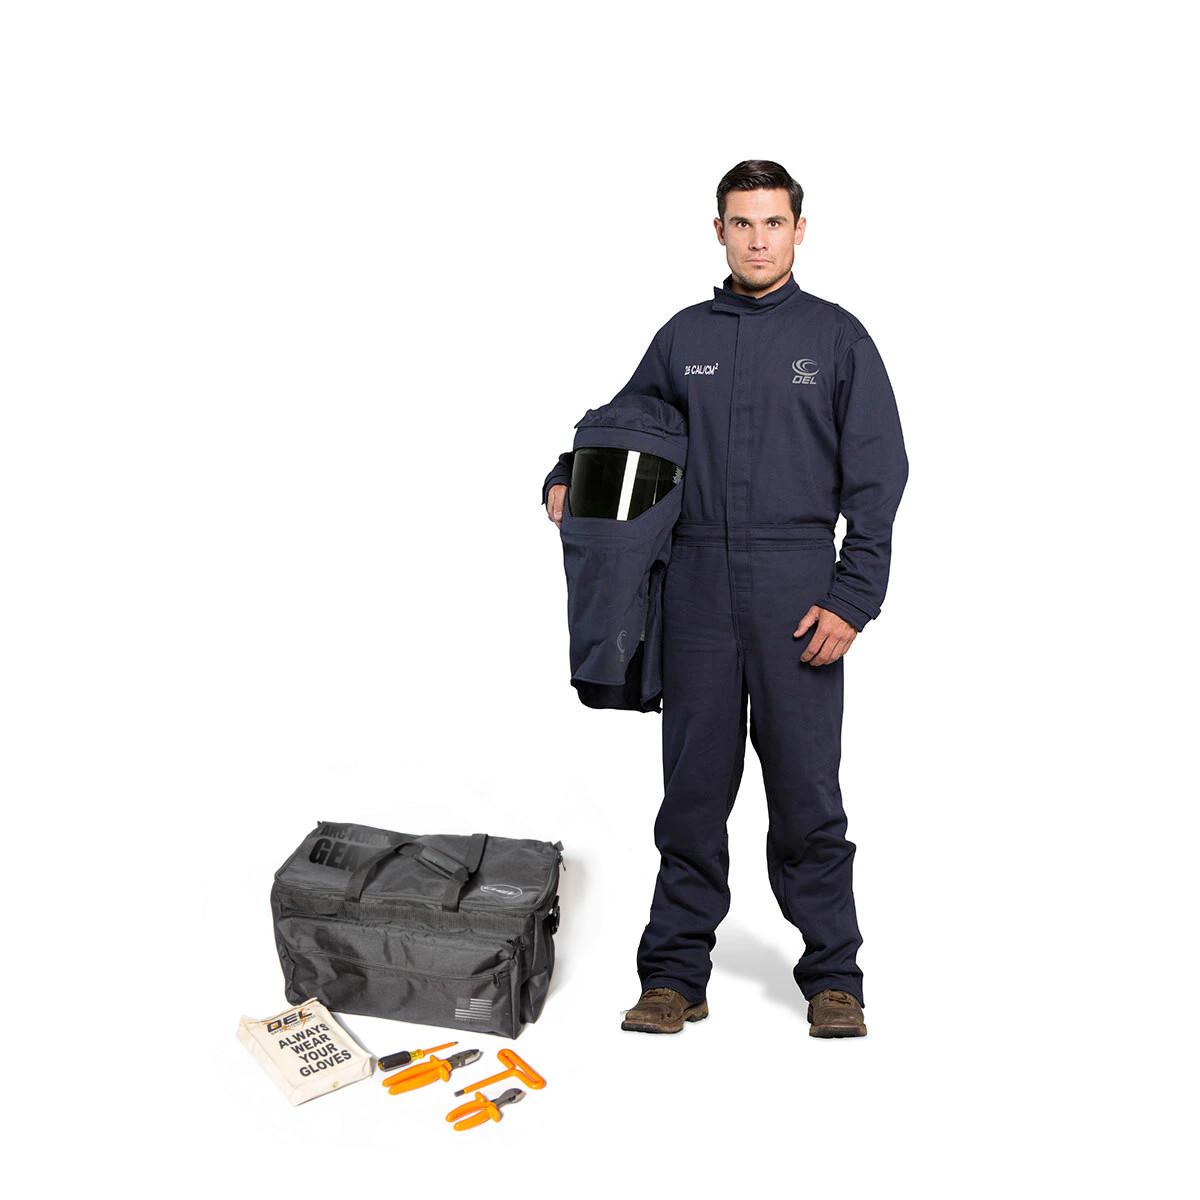 25 Cal Coverall Kit